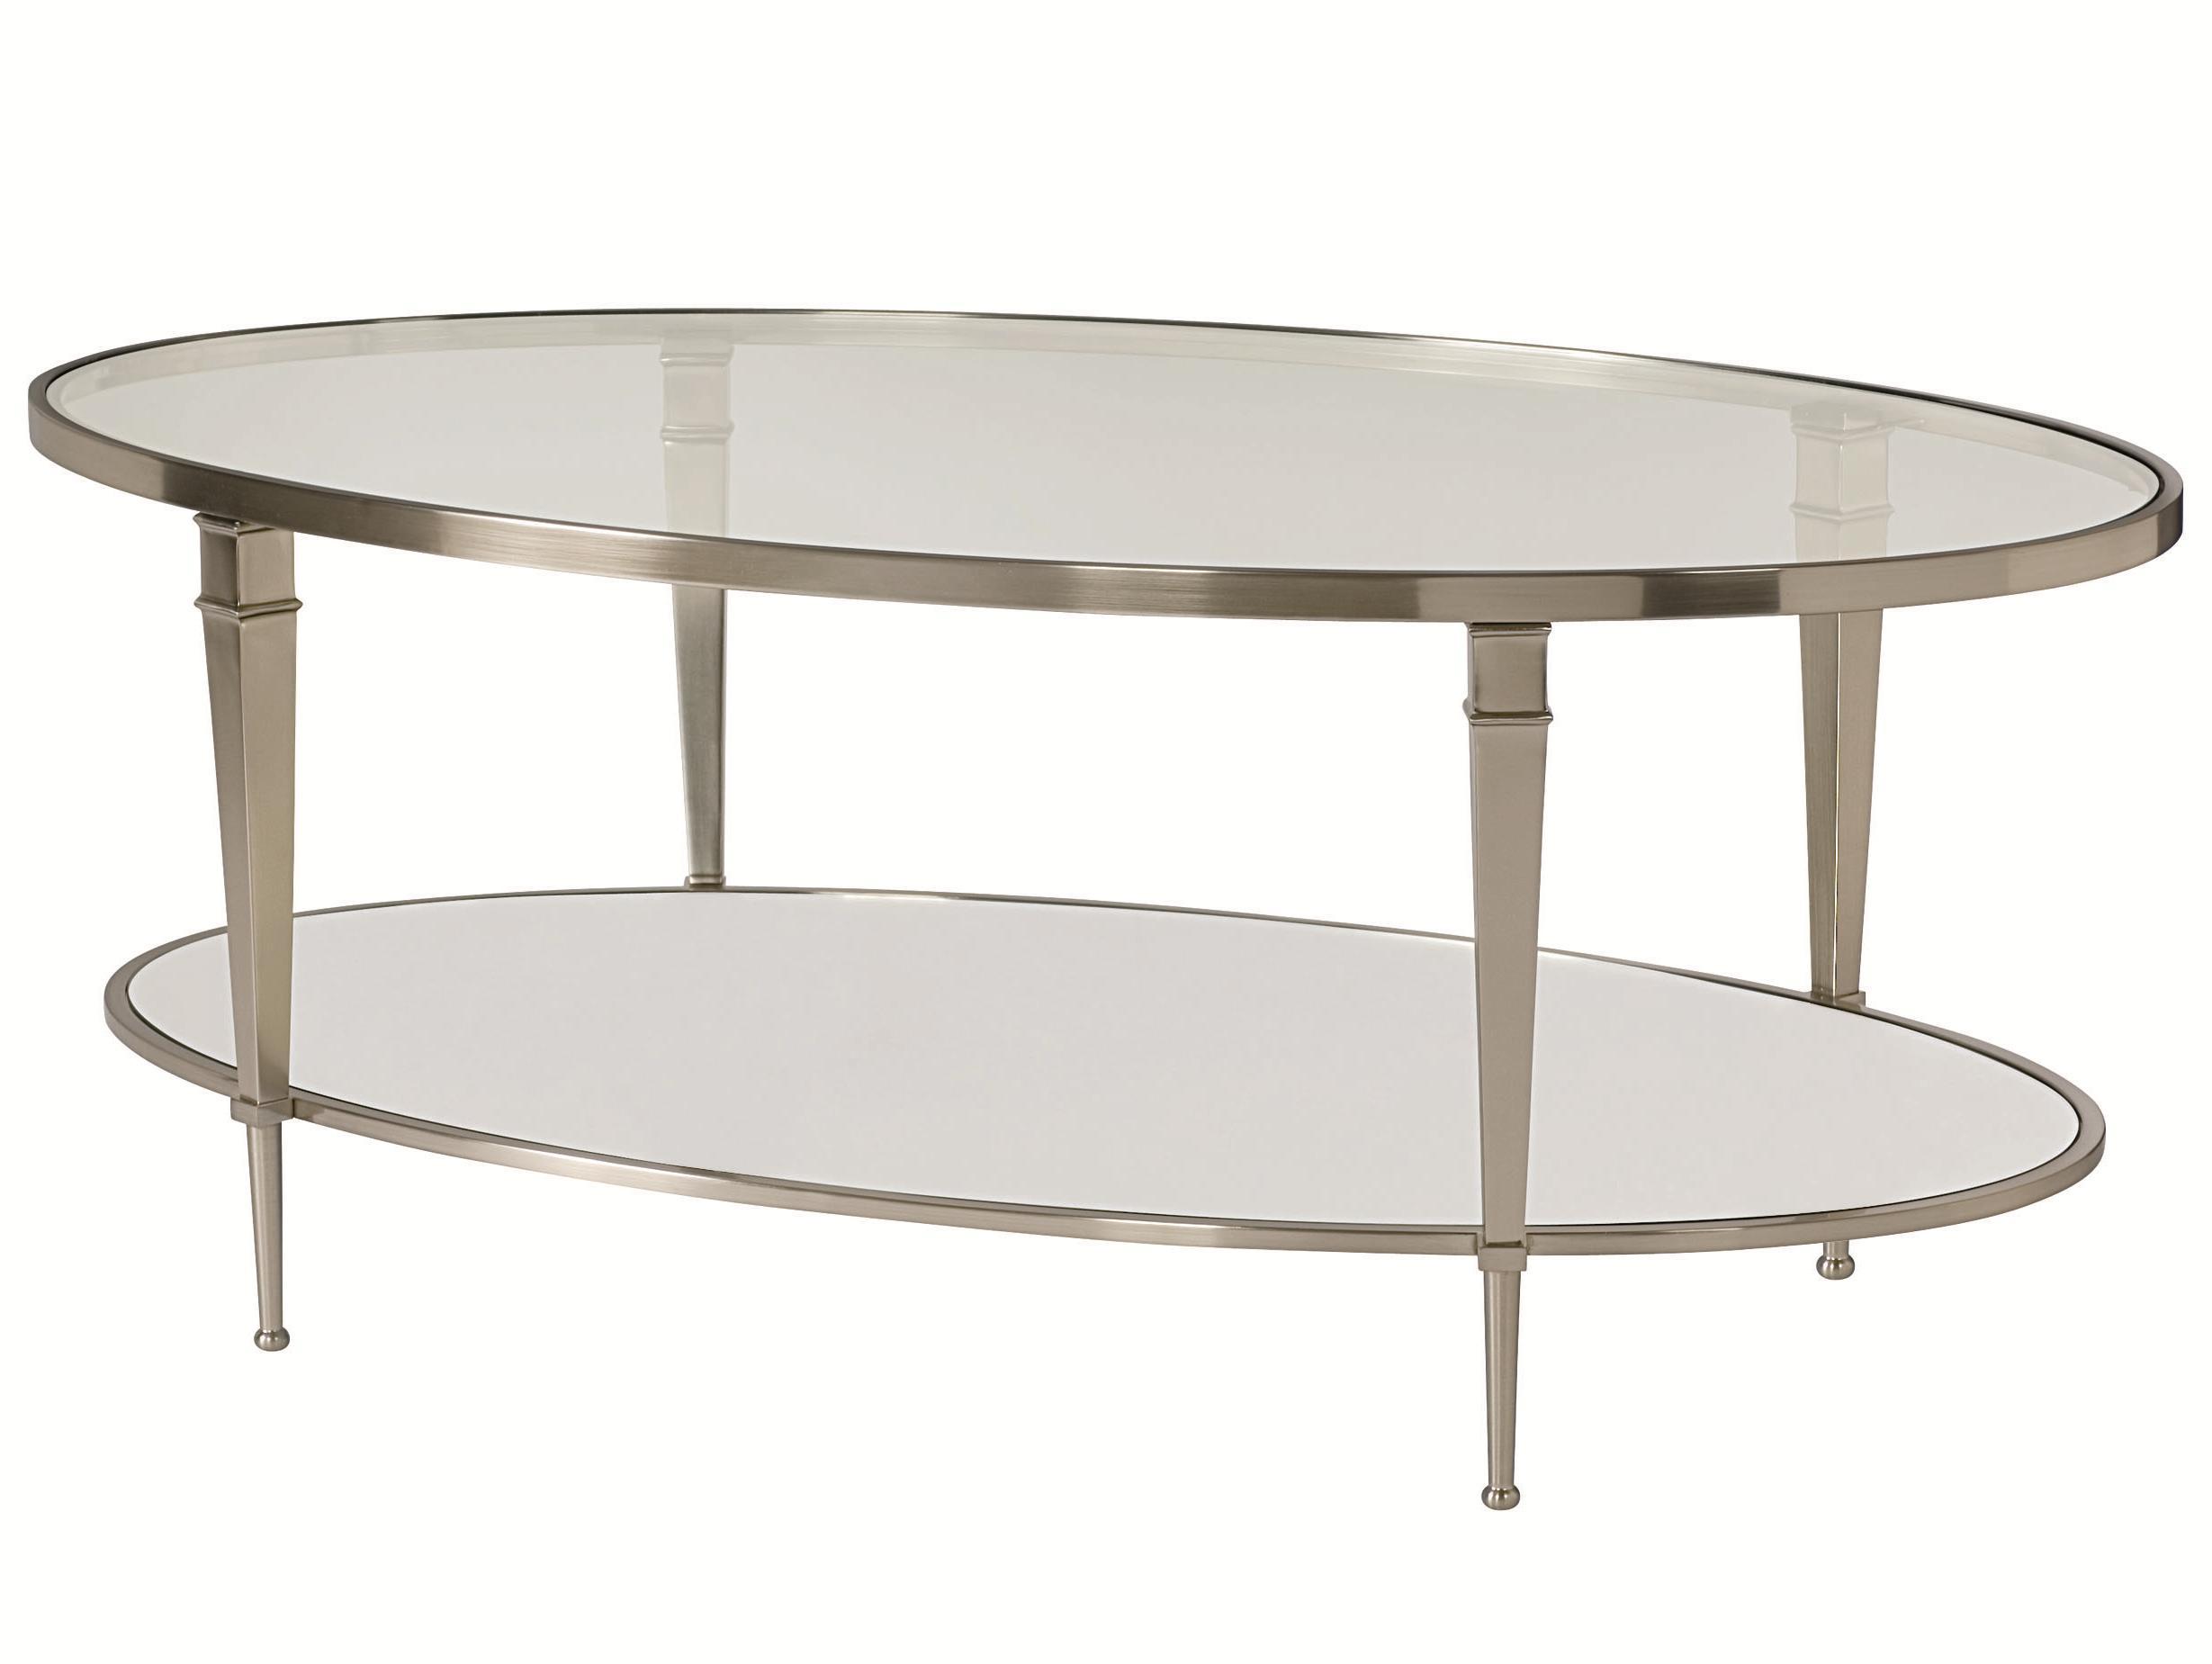 Bon Hammary Mallory Oval Satin Nickel Antique Mirror Finish Cocktail Table